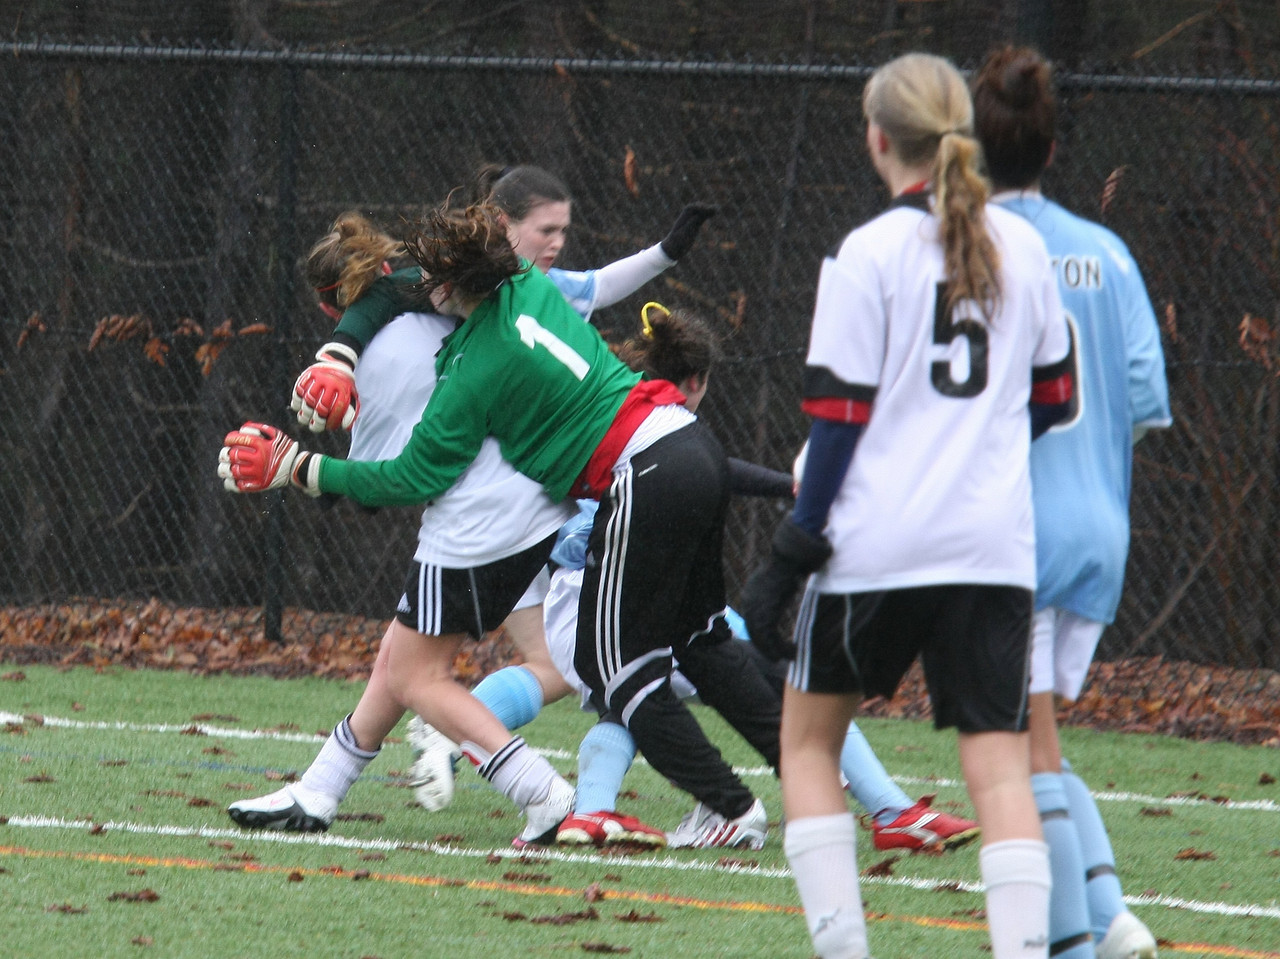 IMG4_9789 Kristin goal seq COE Soccer Scorpion Bowl trmzb